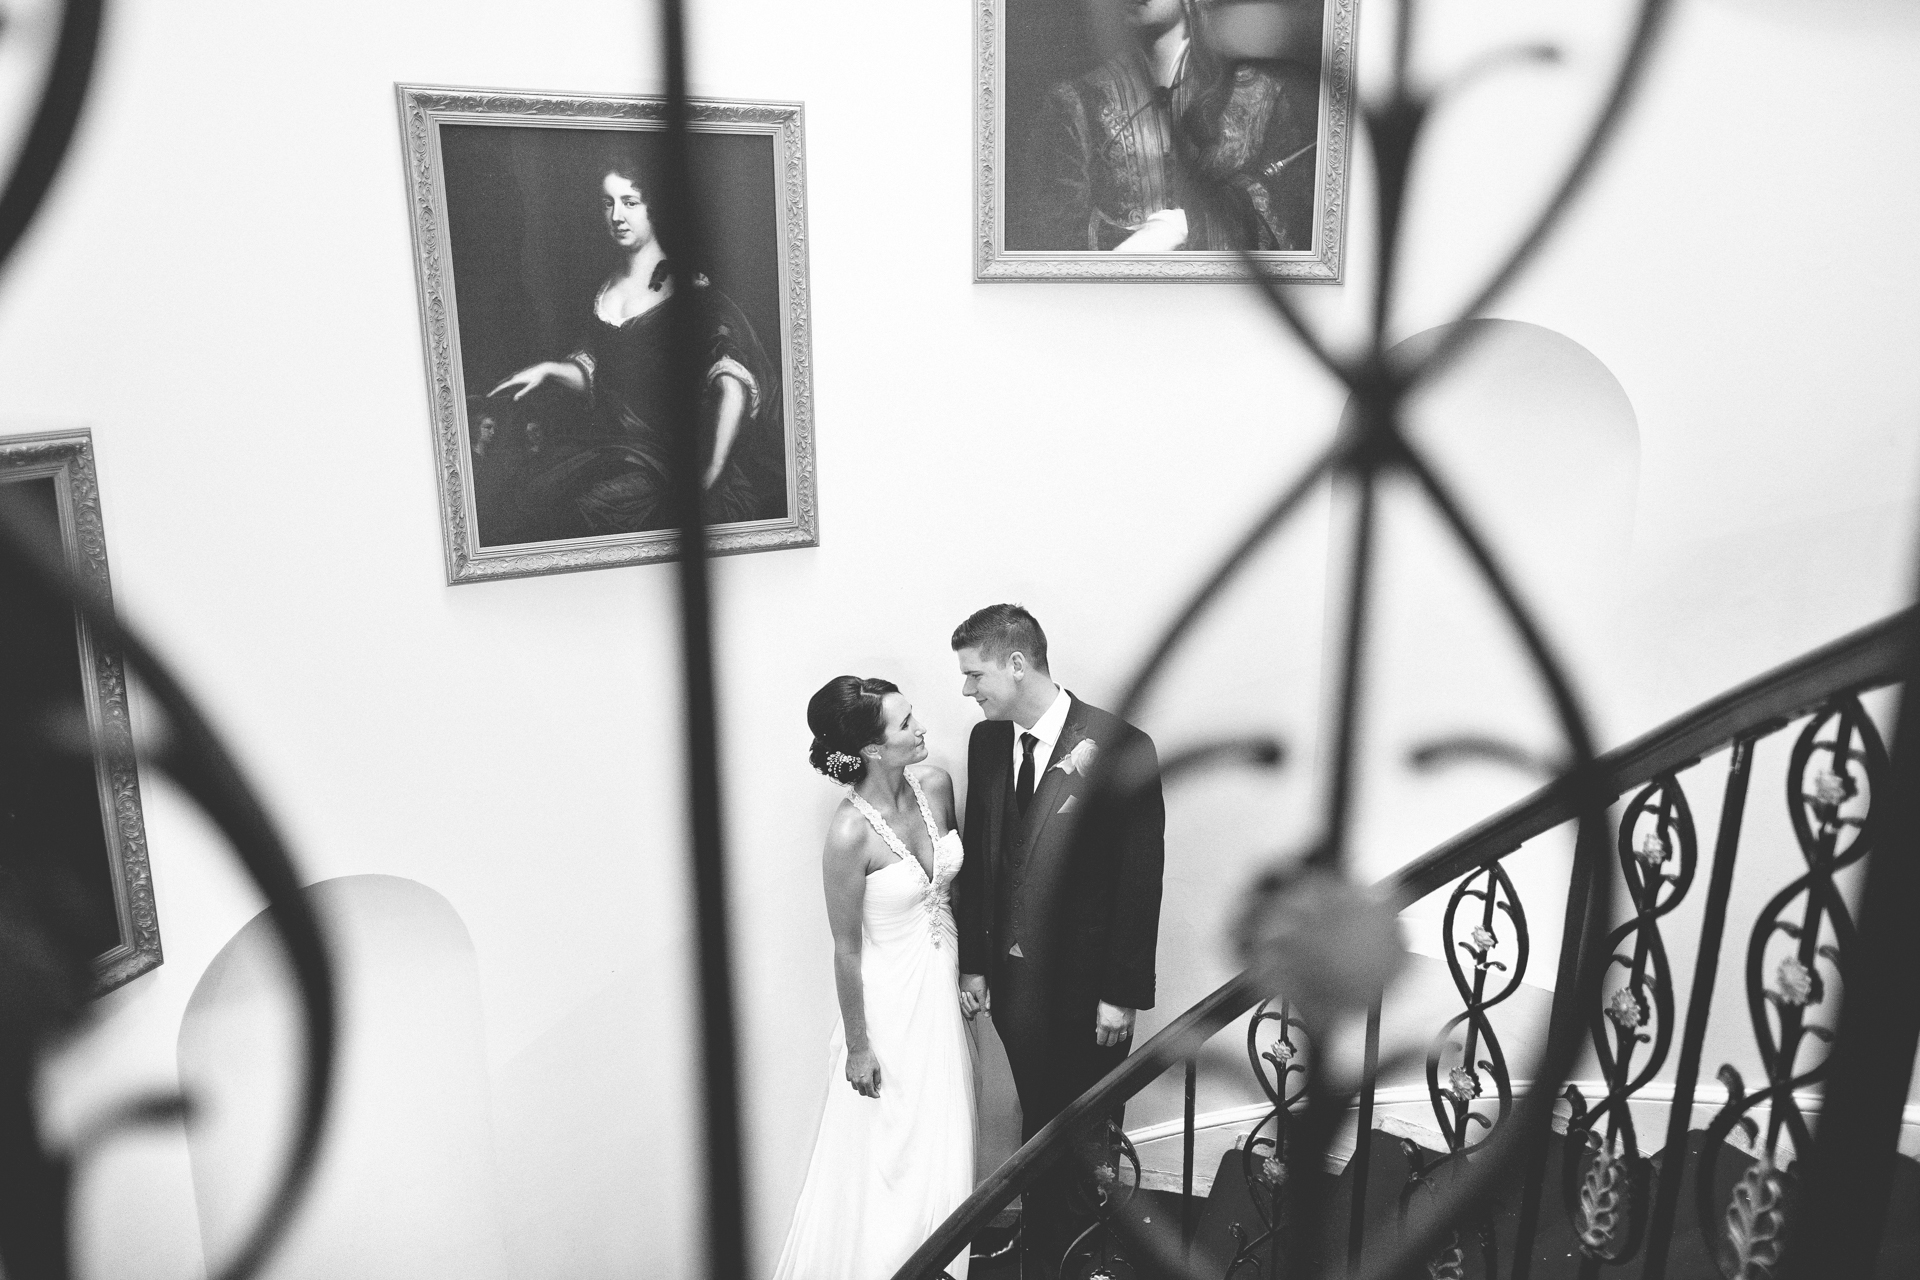 belier house london wedding photography